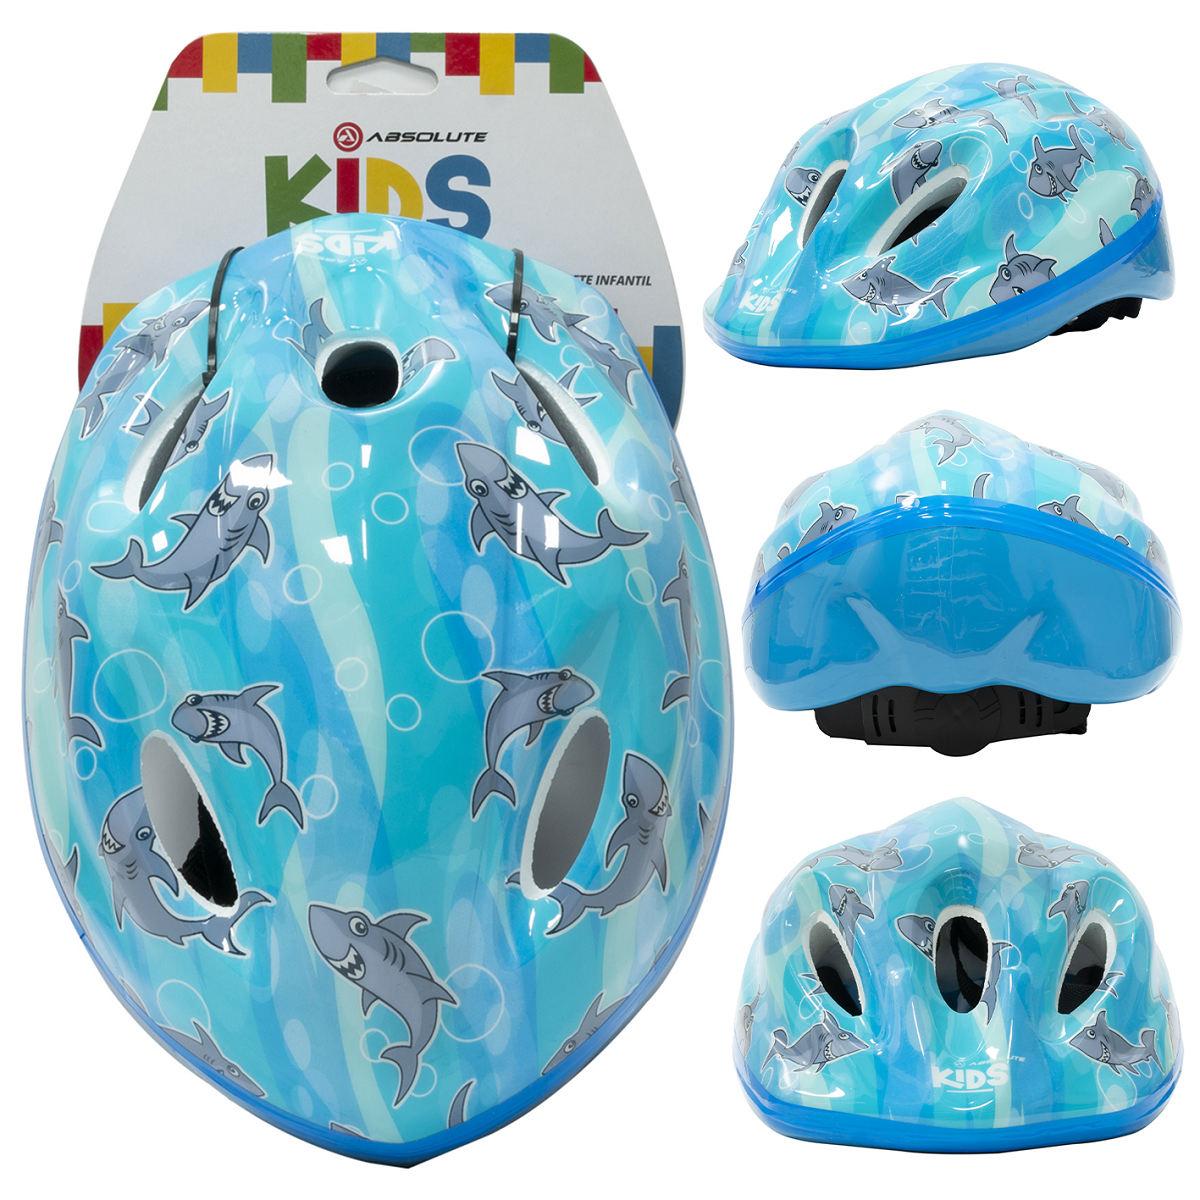 Capacete Infantil Absolute Kids Shake Tubarão - Azul